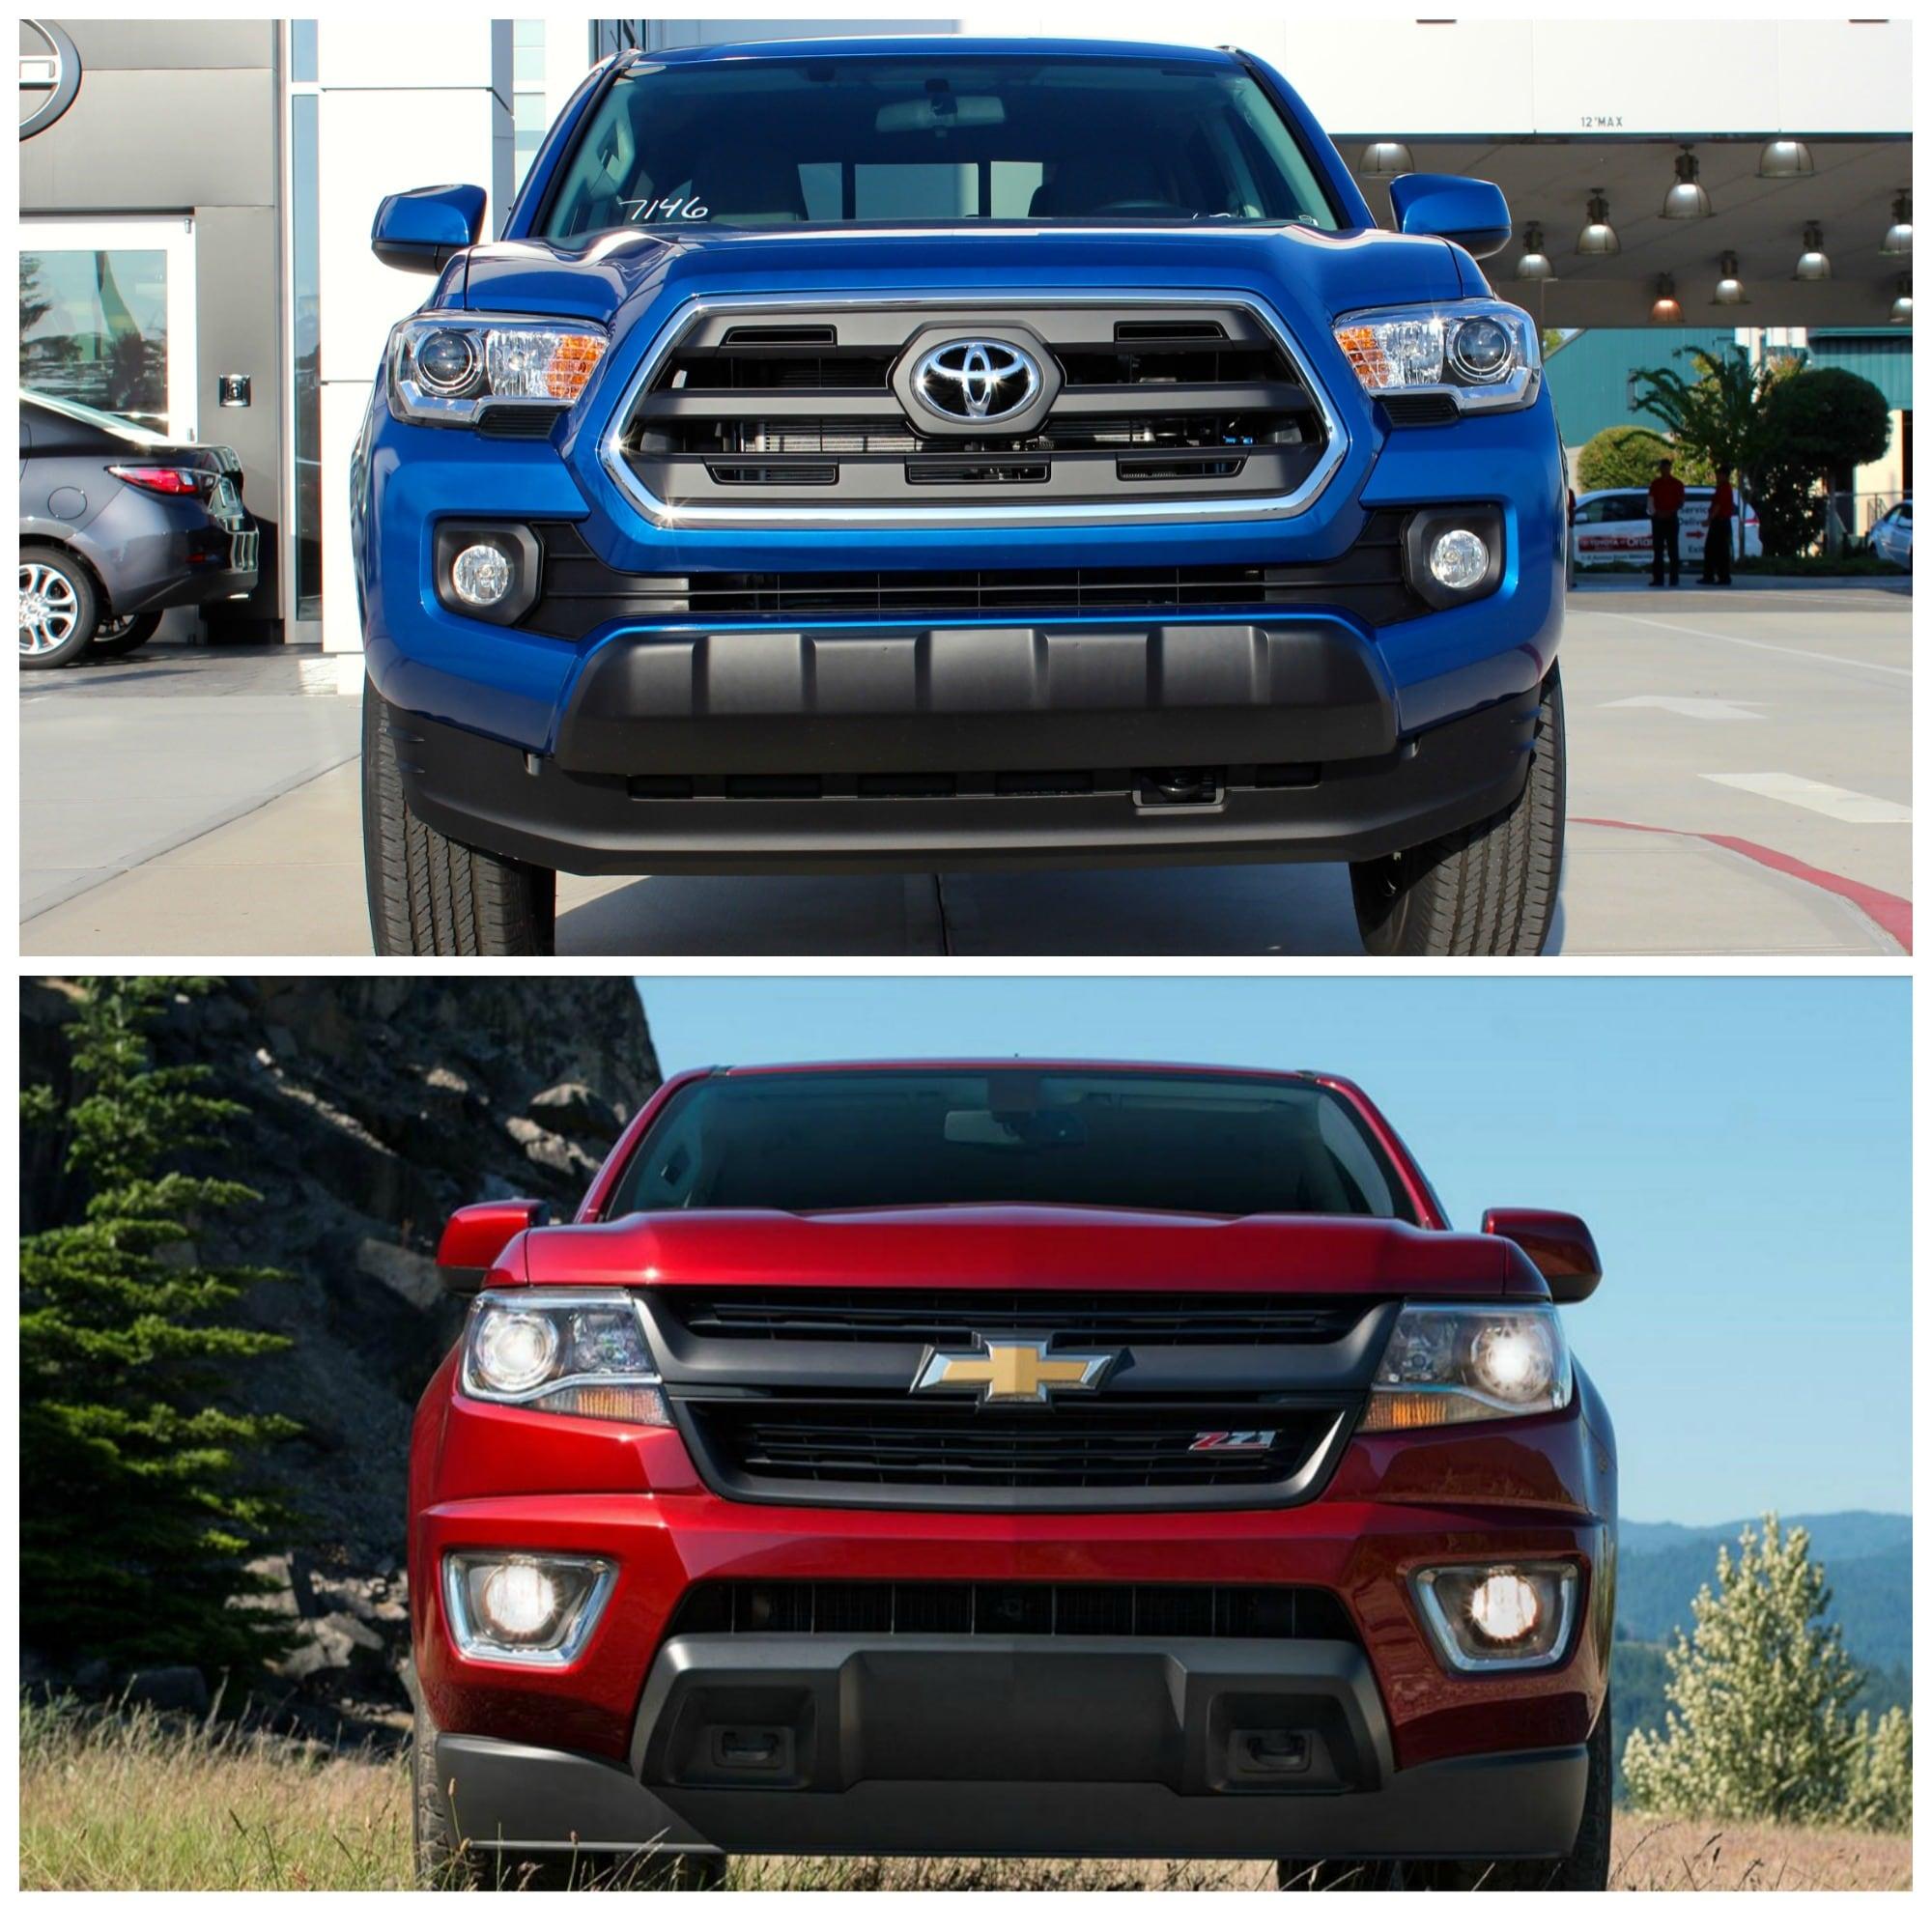 2016 Toyota Tacoma Vs Chevy Colorado